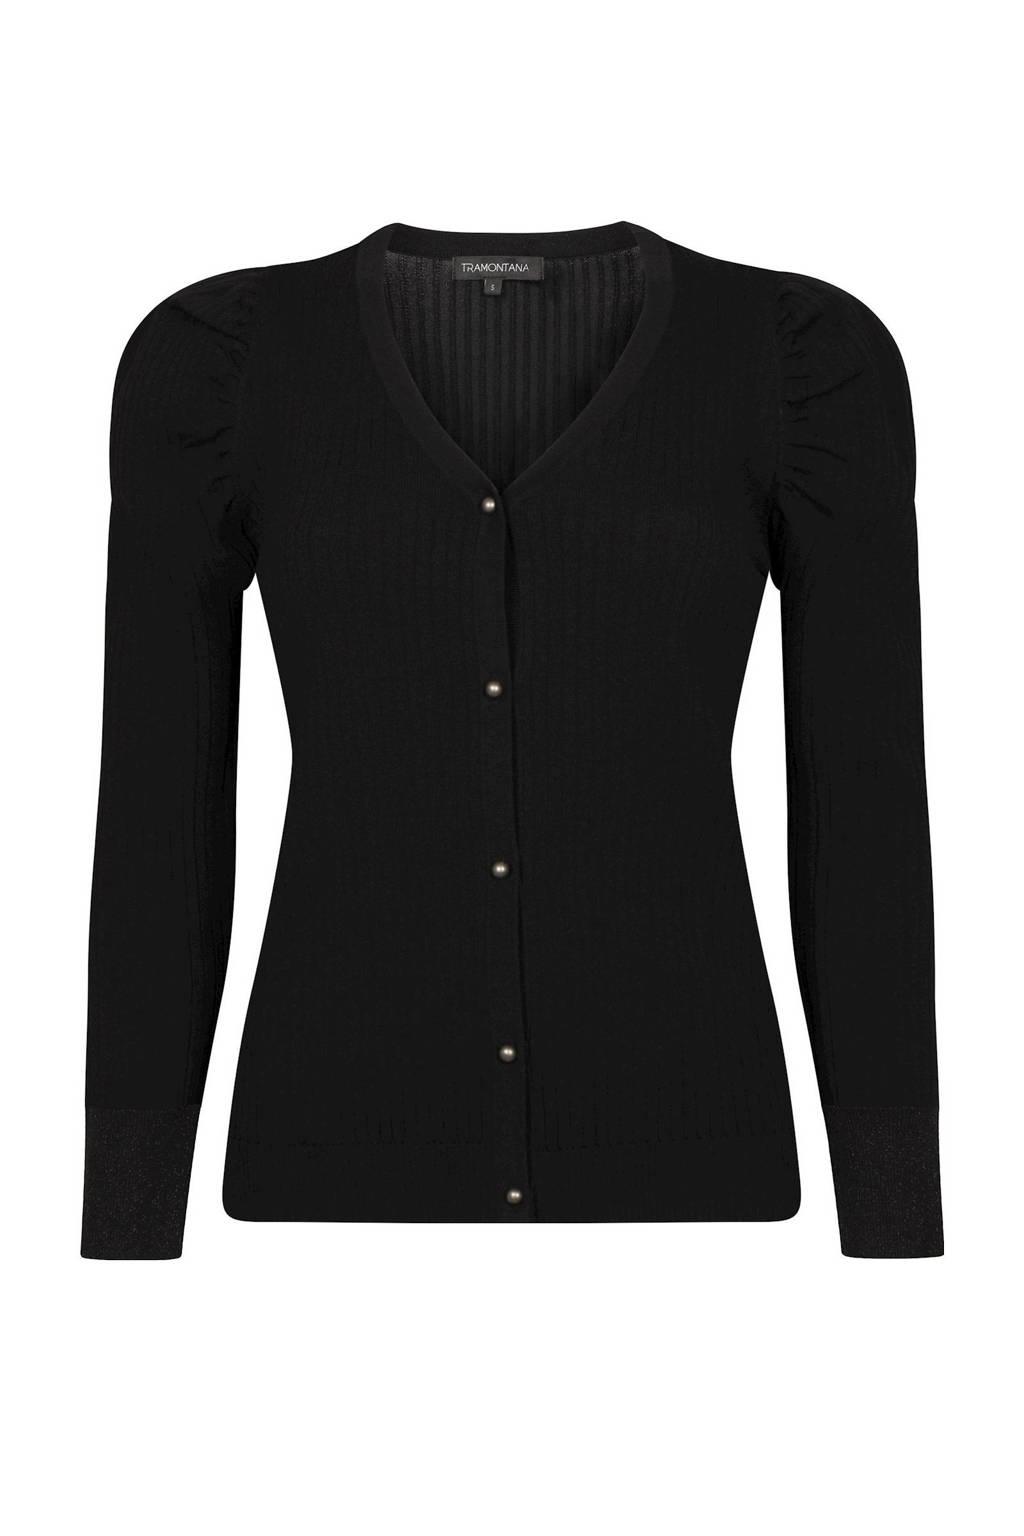 Tramontana ribgebreid vest zwart, Zwart